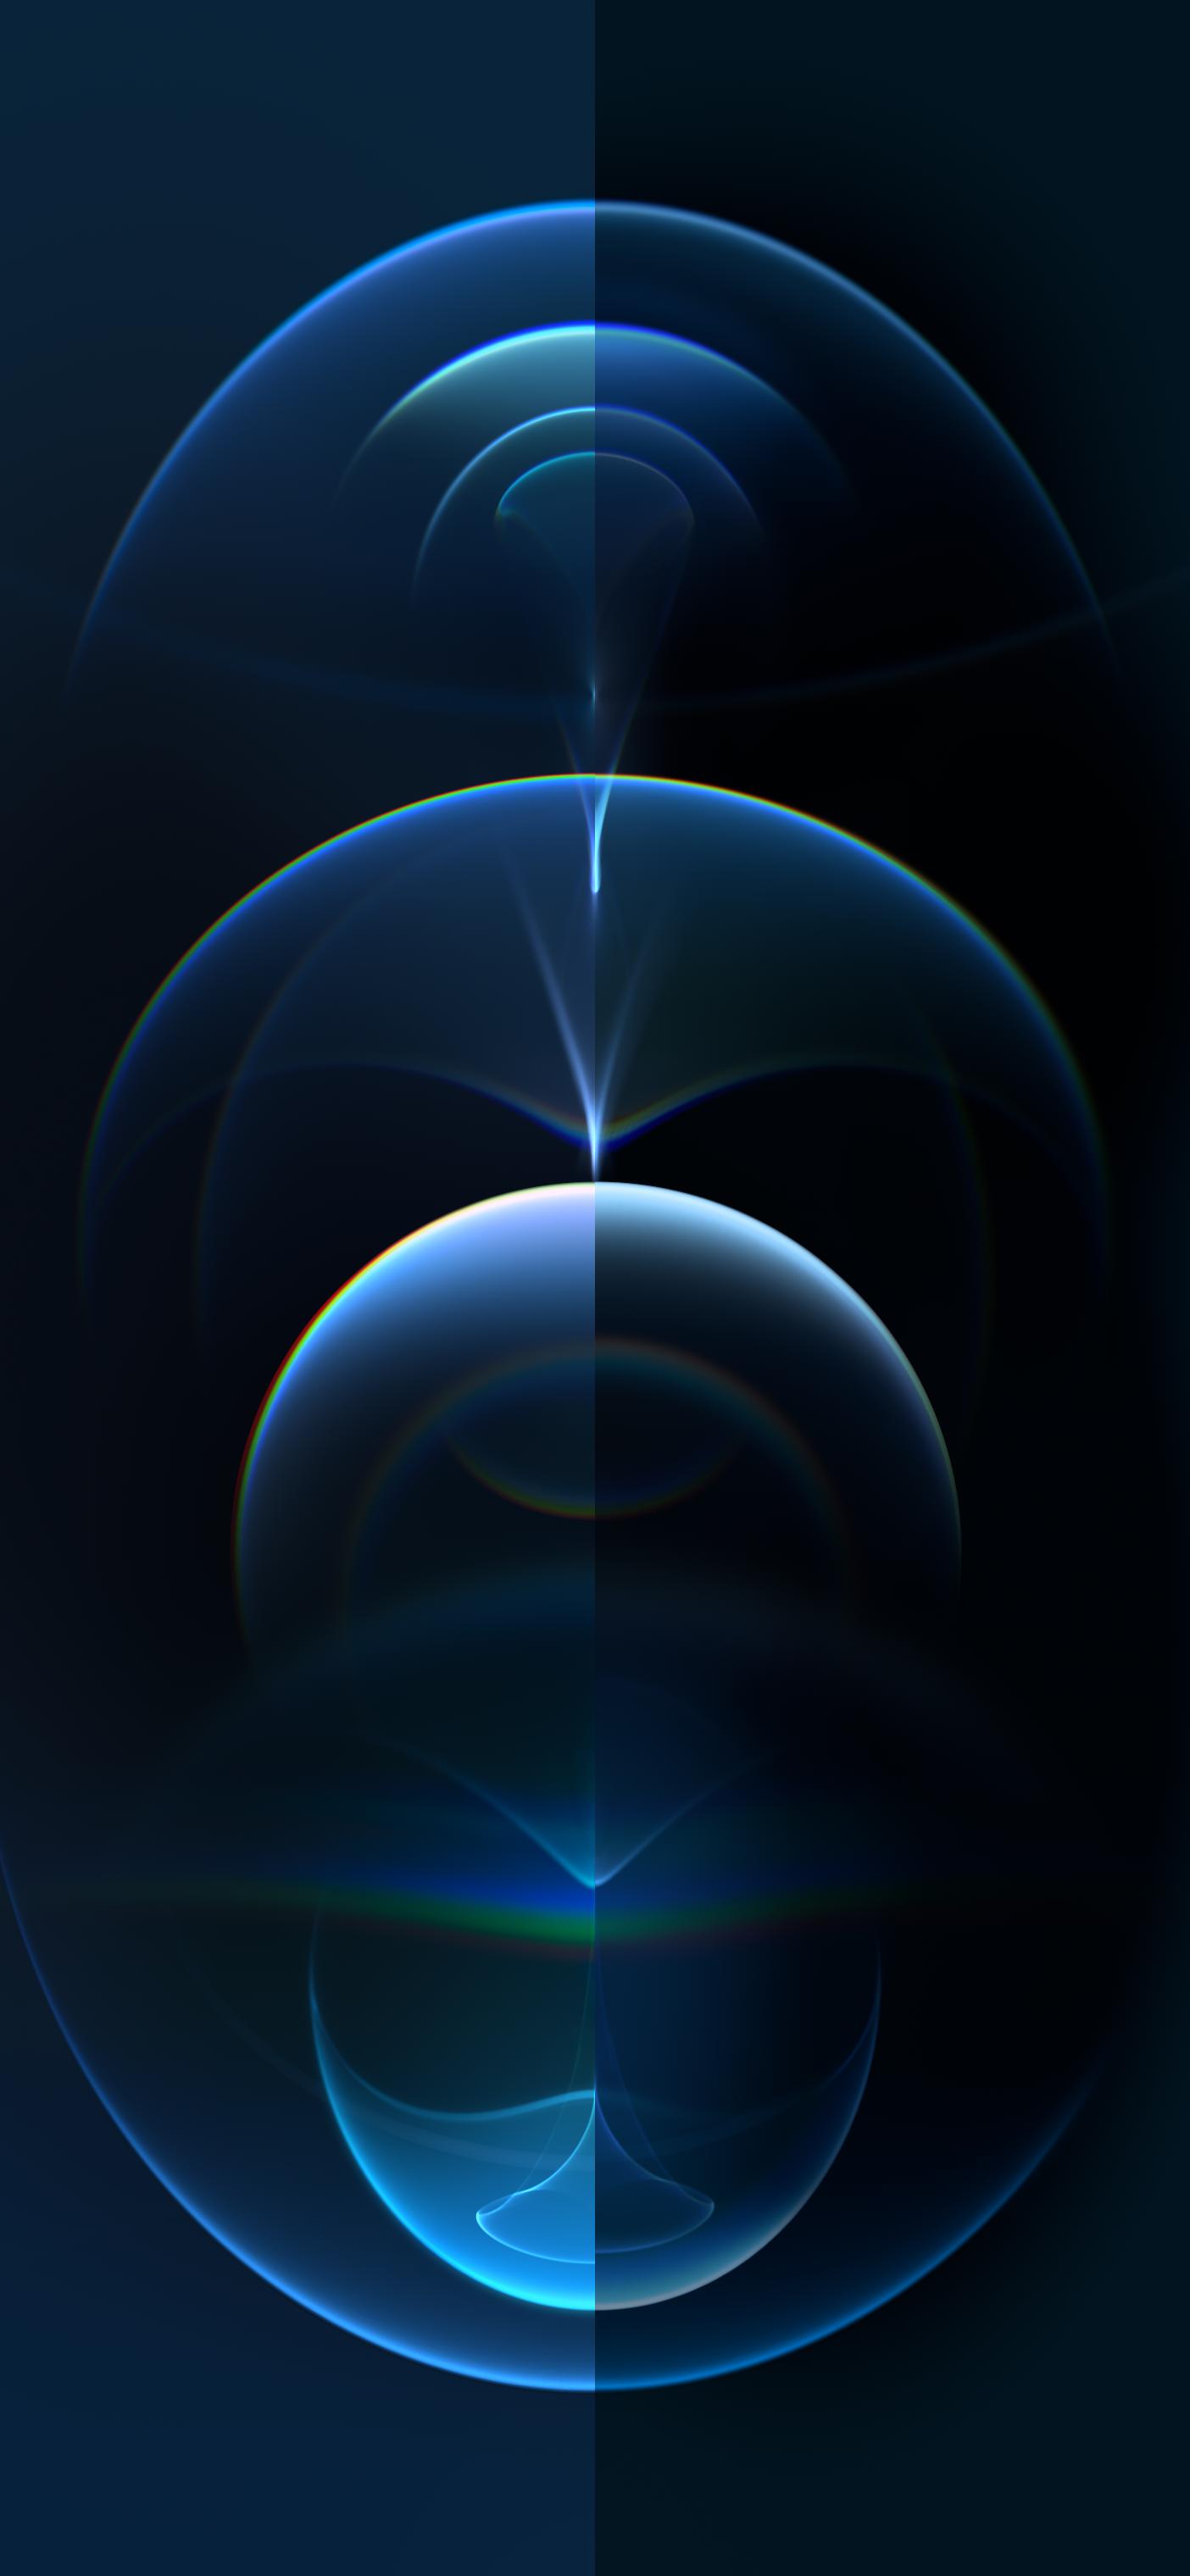 Resonance Blue Dark Dual Iphone Lockscreen Wallpaper Dark Phone Wallpapers Iphone Homescreen Wallpaper